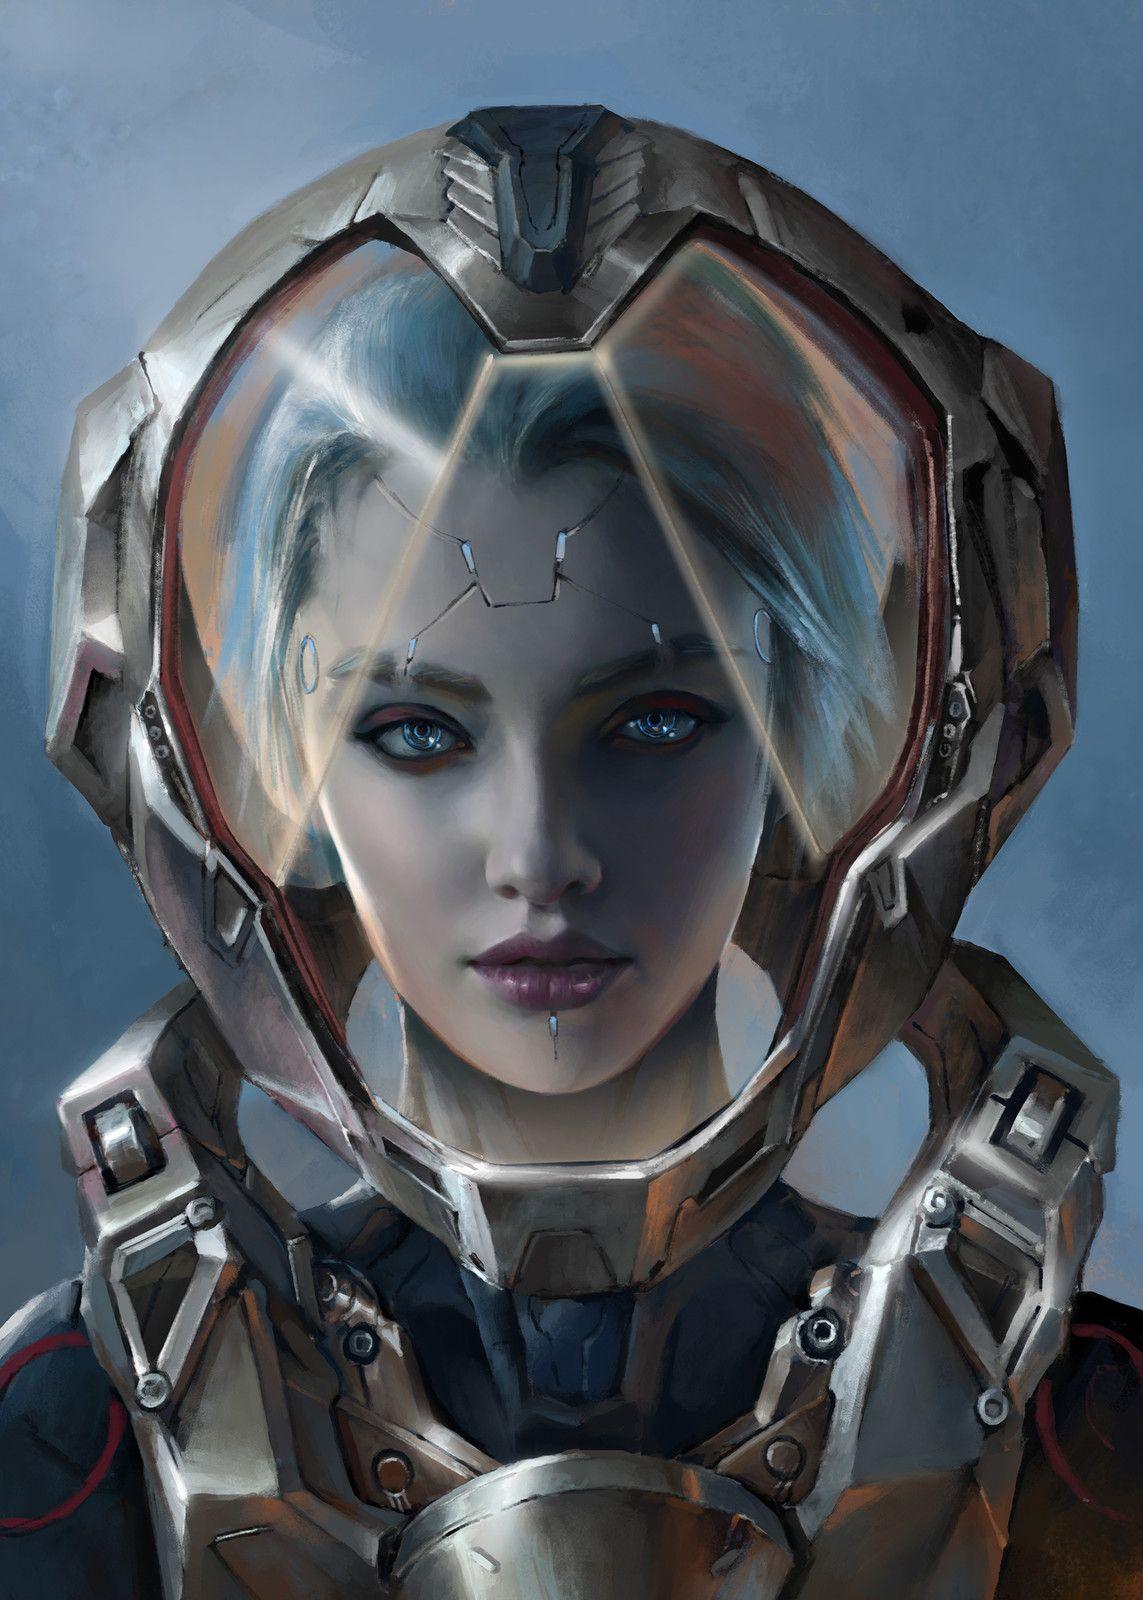 Pin By Pawel Daruk On Cyberpunk Sci Fi Art Cyberpunk Art Cyberpunk Character Sci Fi Art